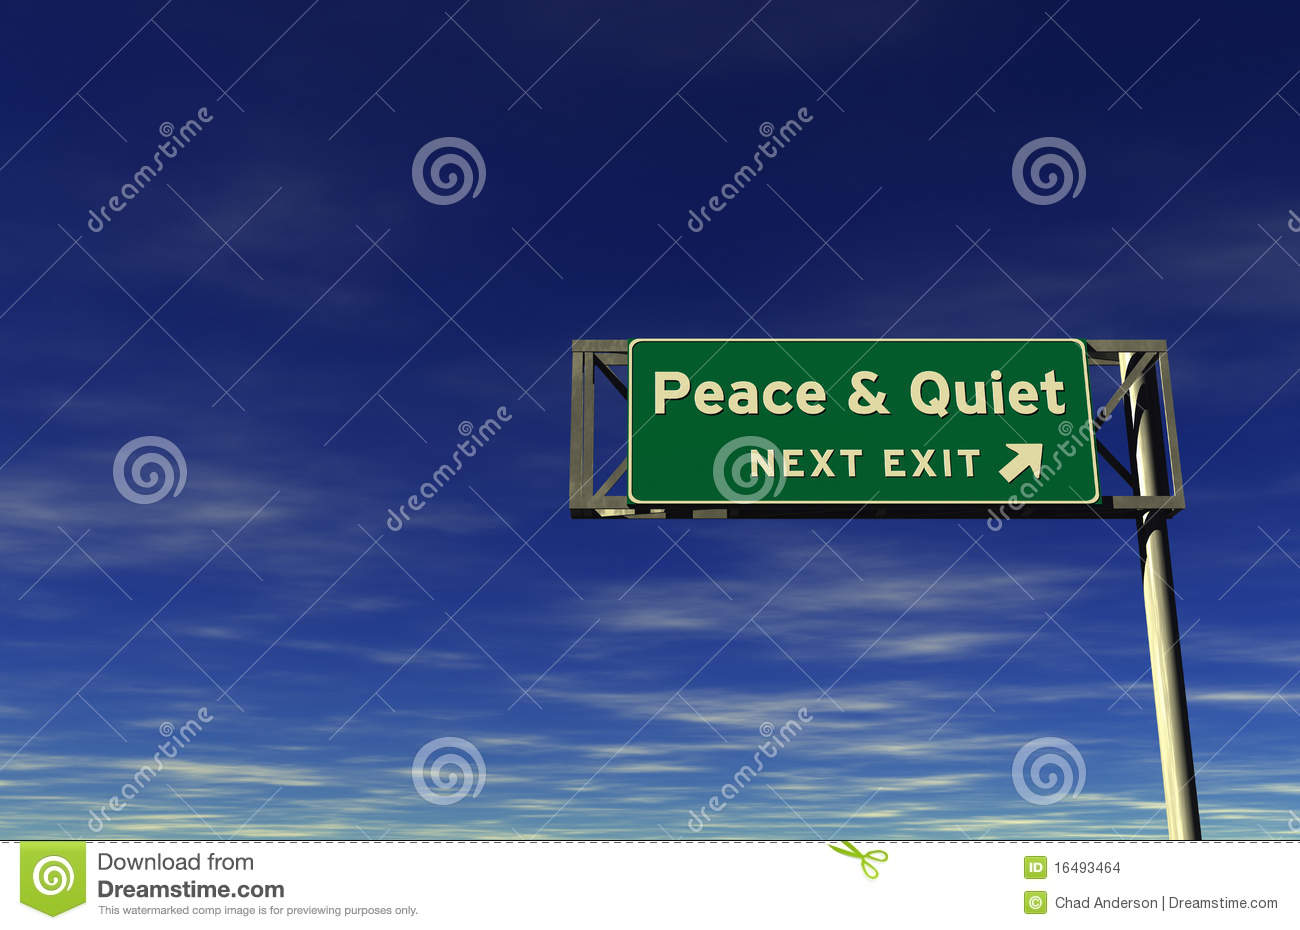 Peace & Quiet Freeway Exit Sign Stock Images.